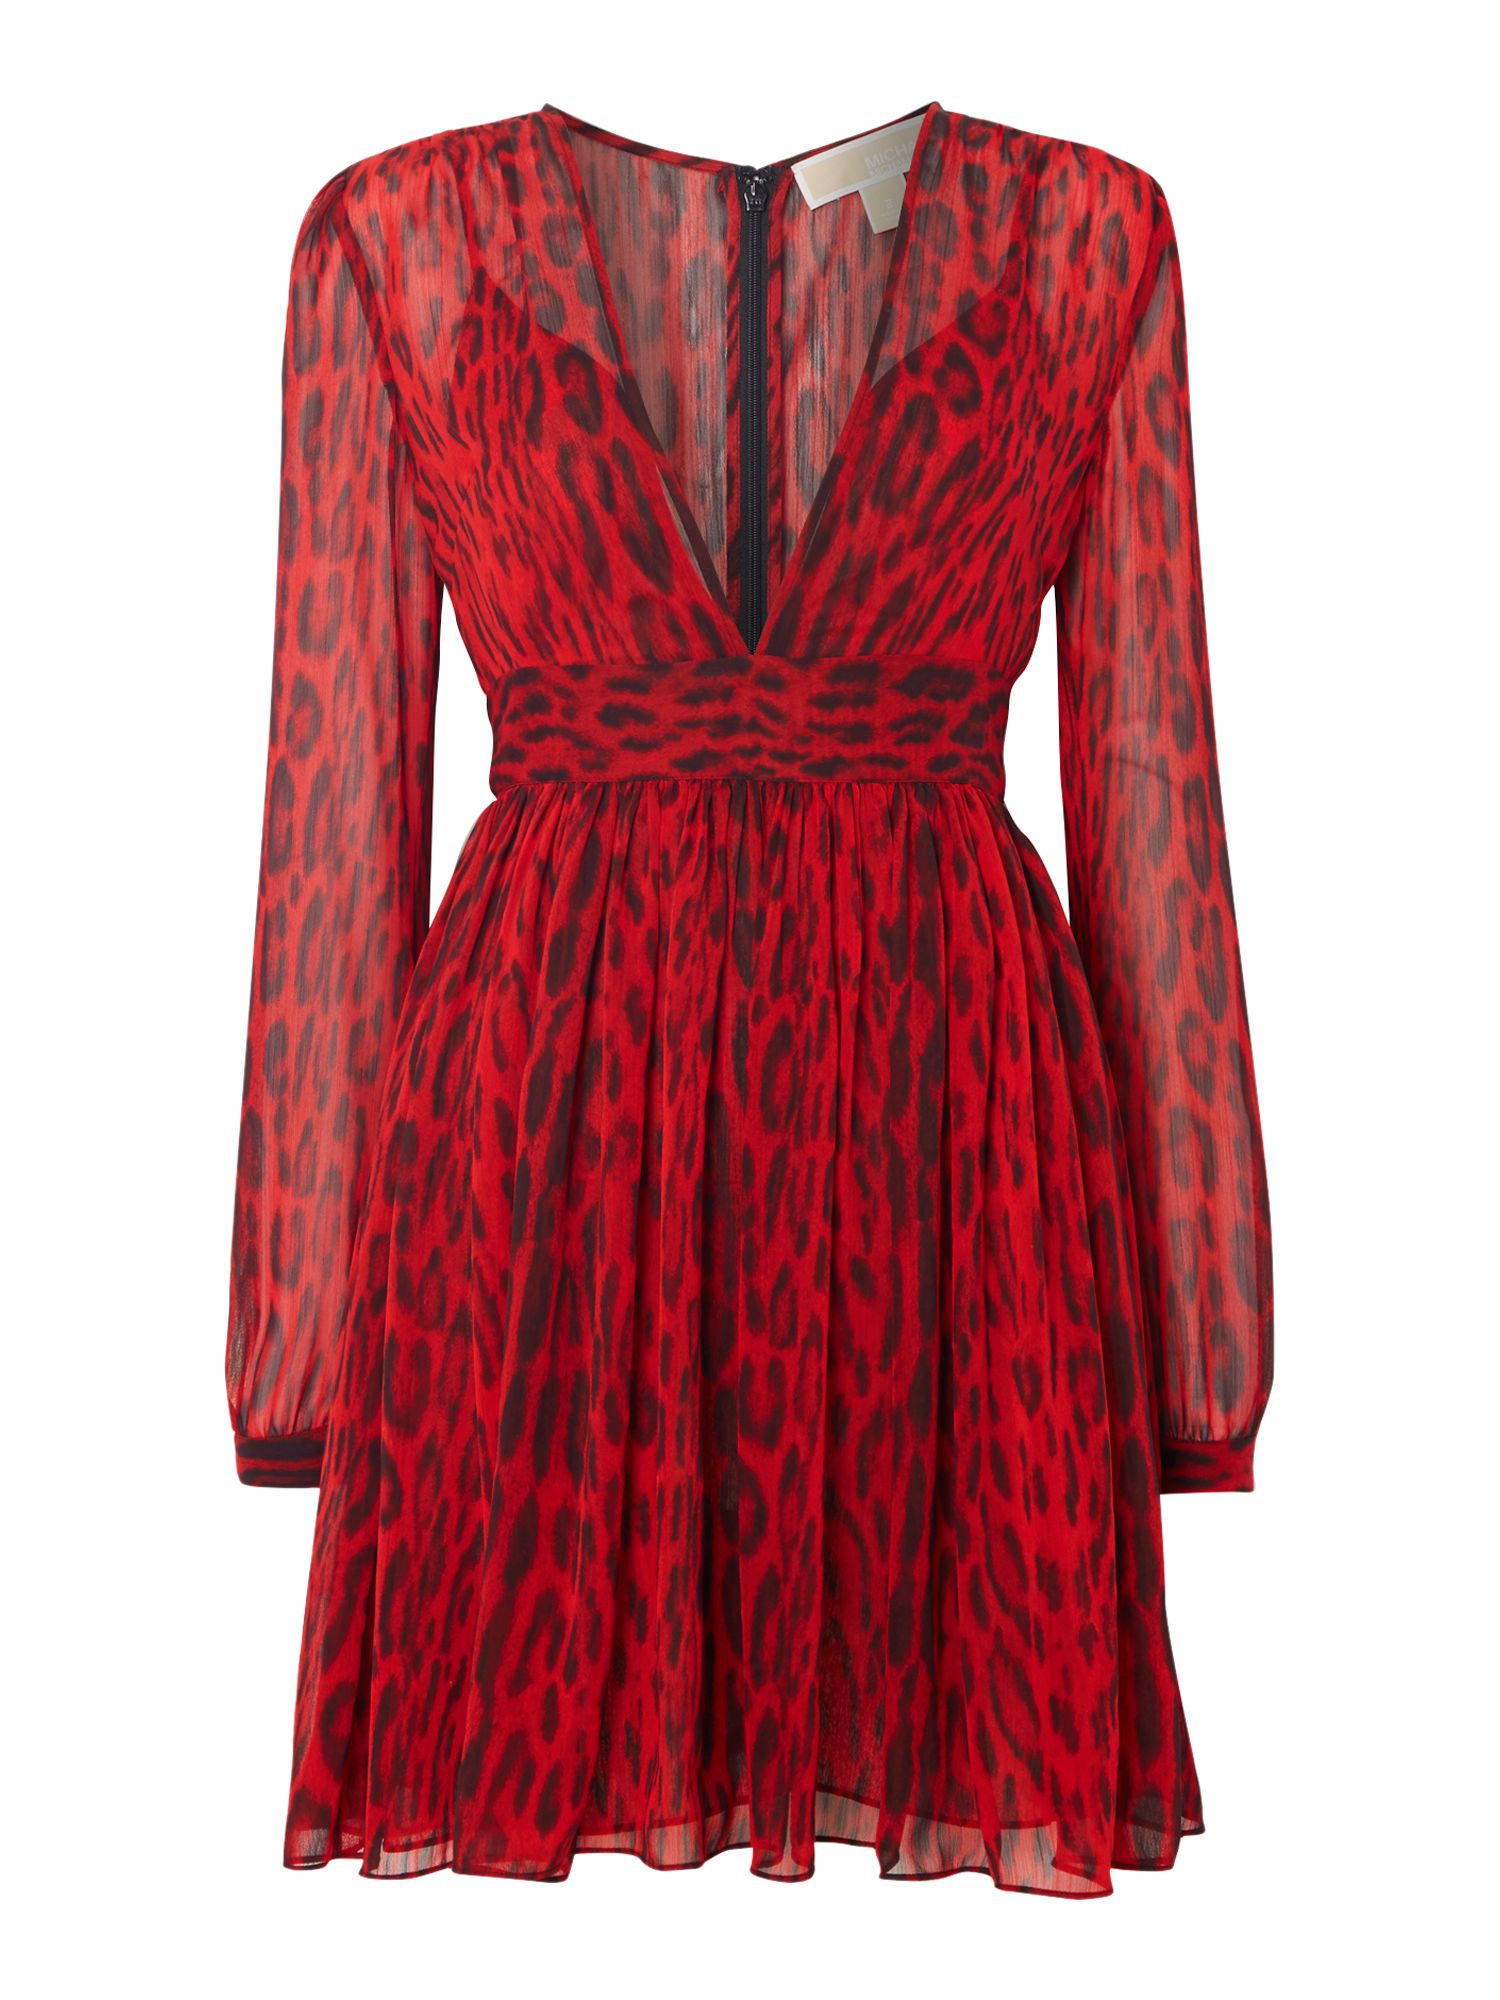 Michael kors Long Sleeve Animal Print Dress in Red  Lyst